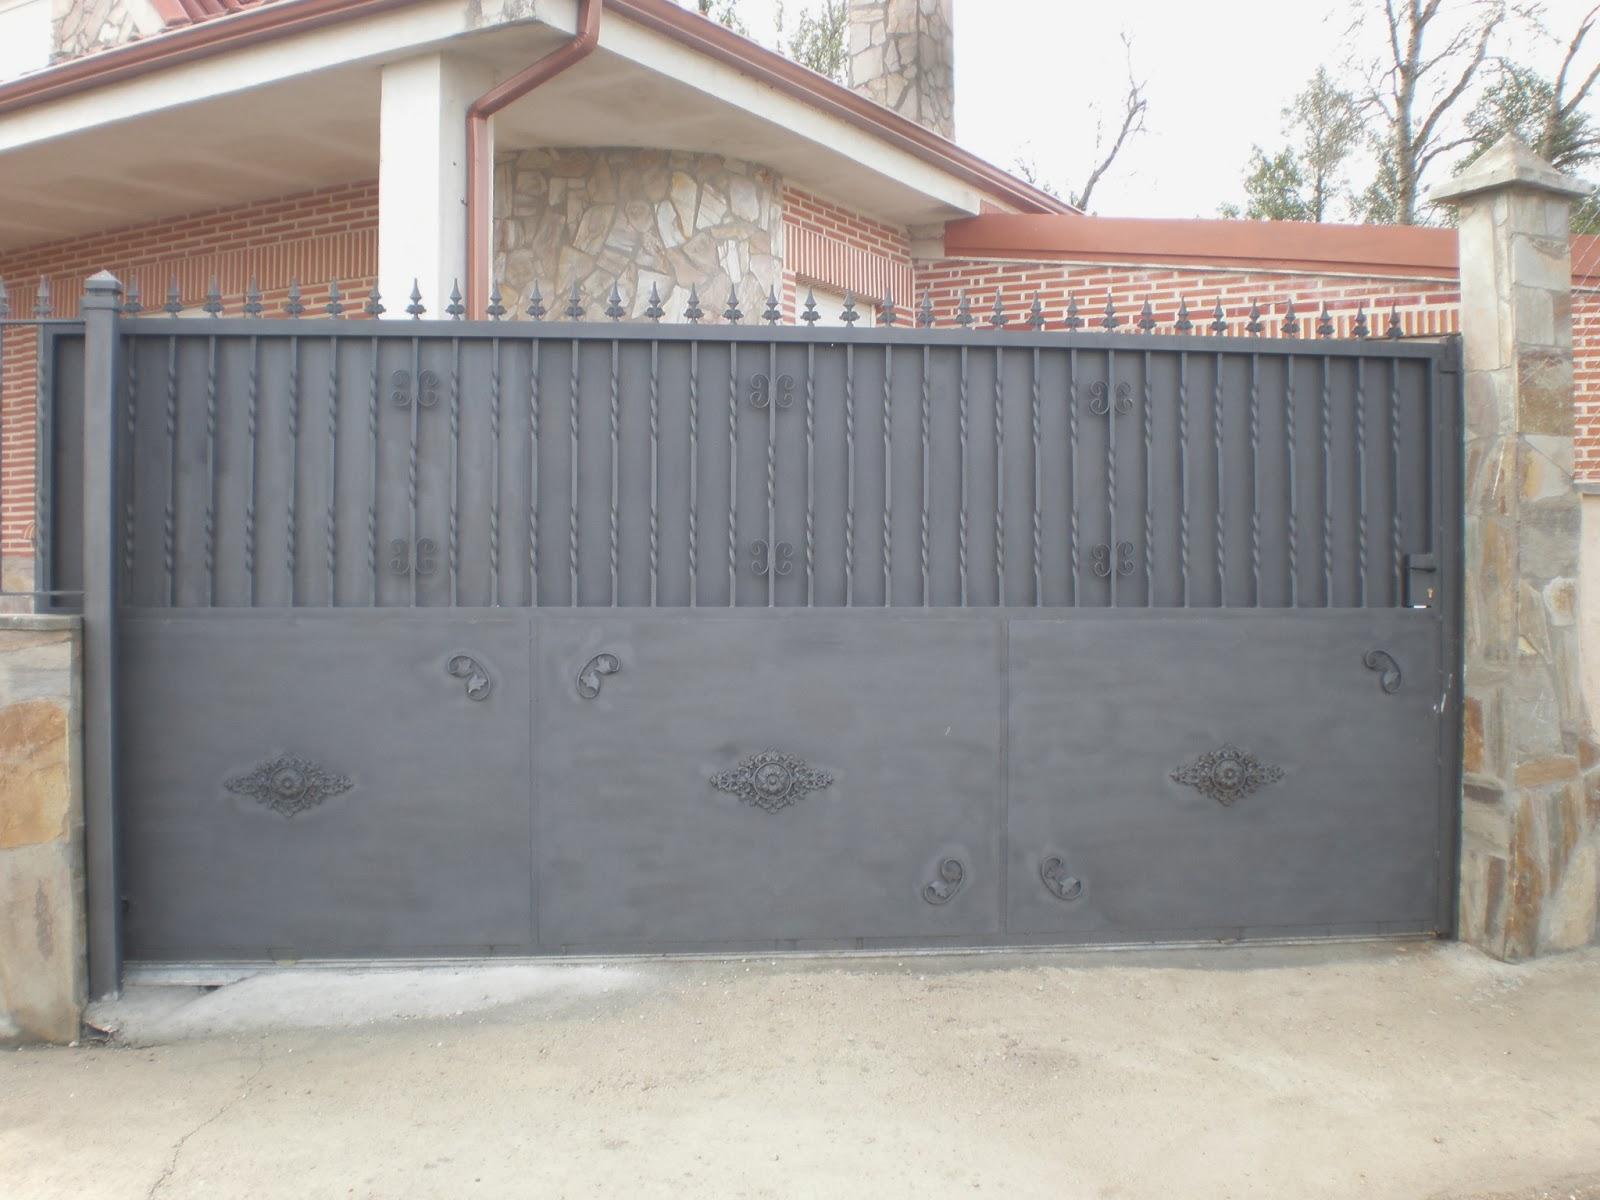 Carpinteria metalica charro modelos varios puertas de for Puertas metalicas modelos